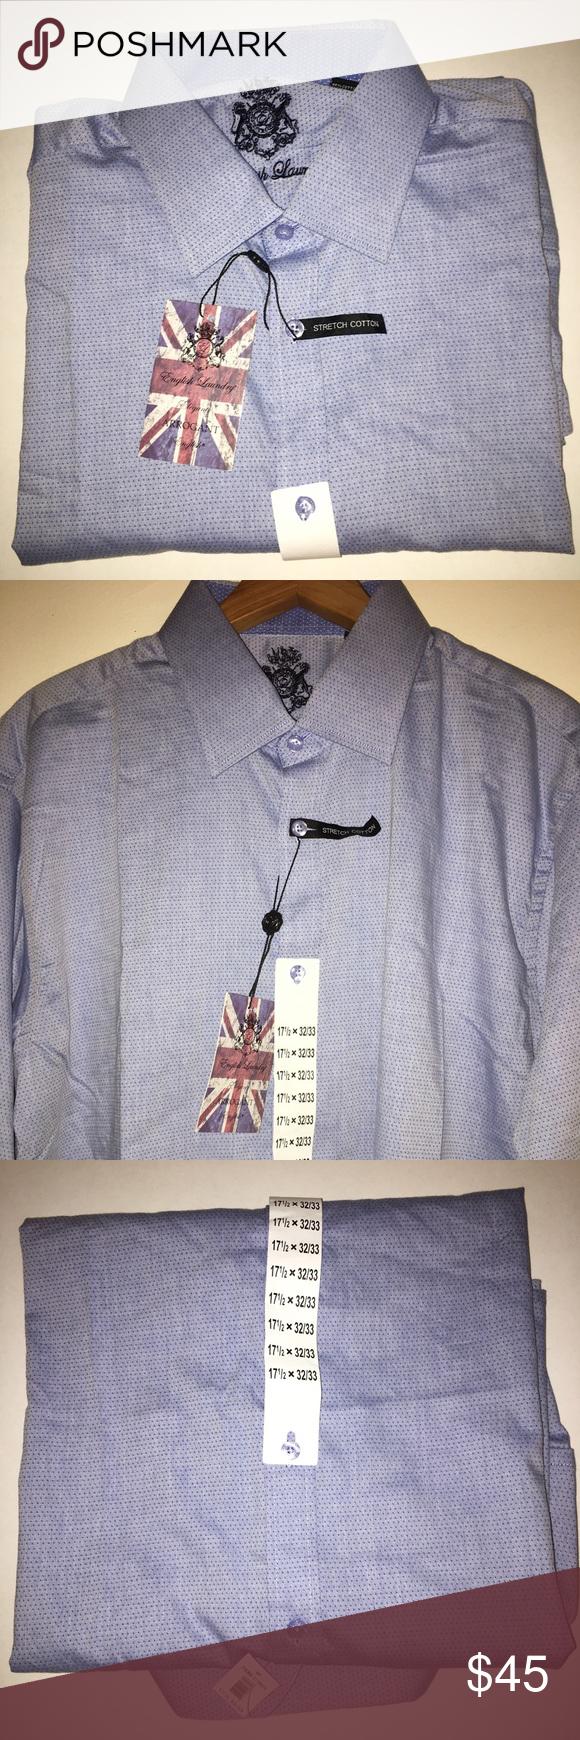 English Laundry Men S Stretch Cotton Dress Shirt Nwt Cotton